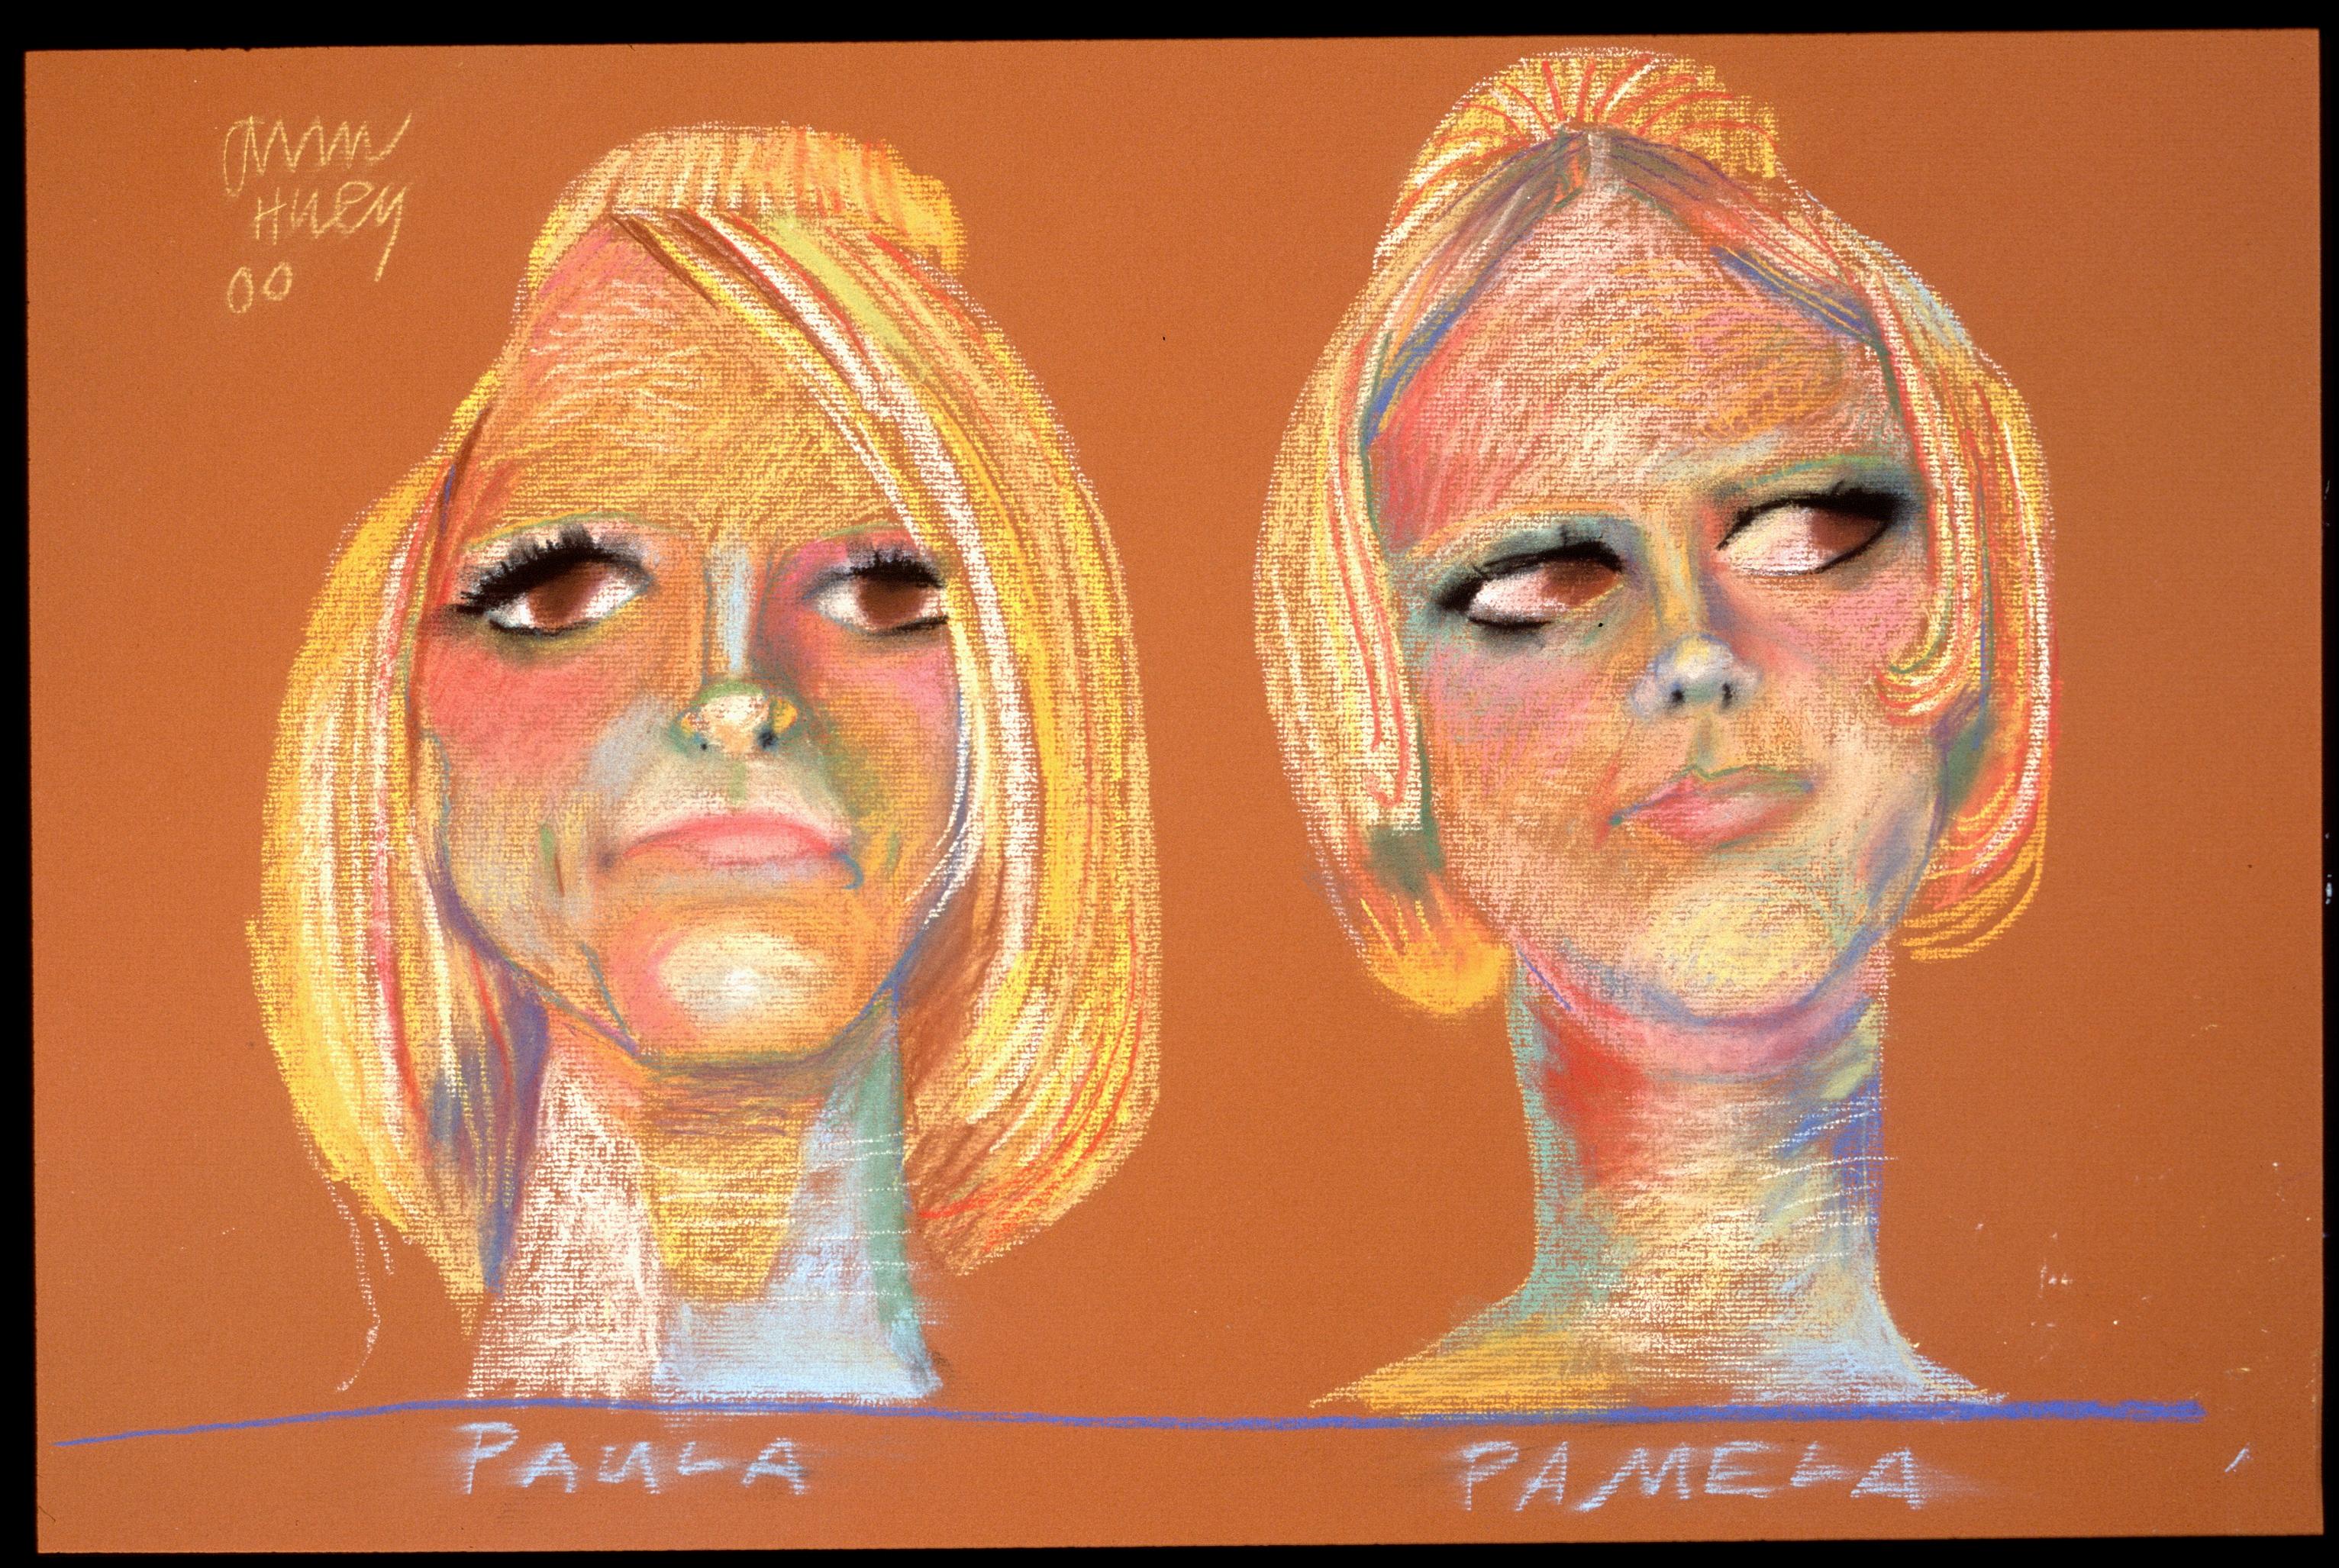 Paula and Pamela - 1967